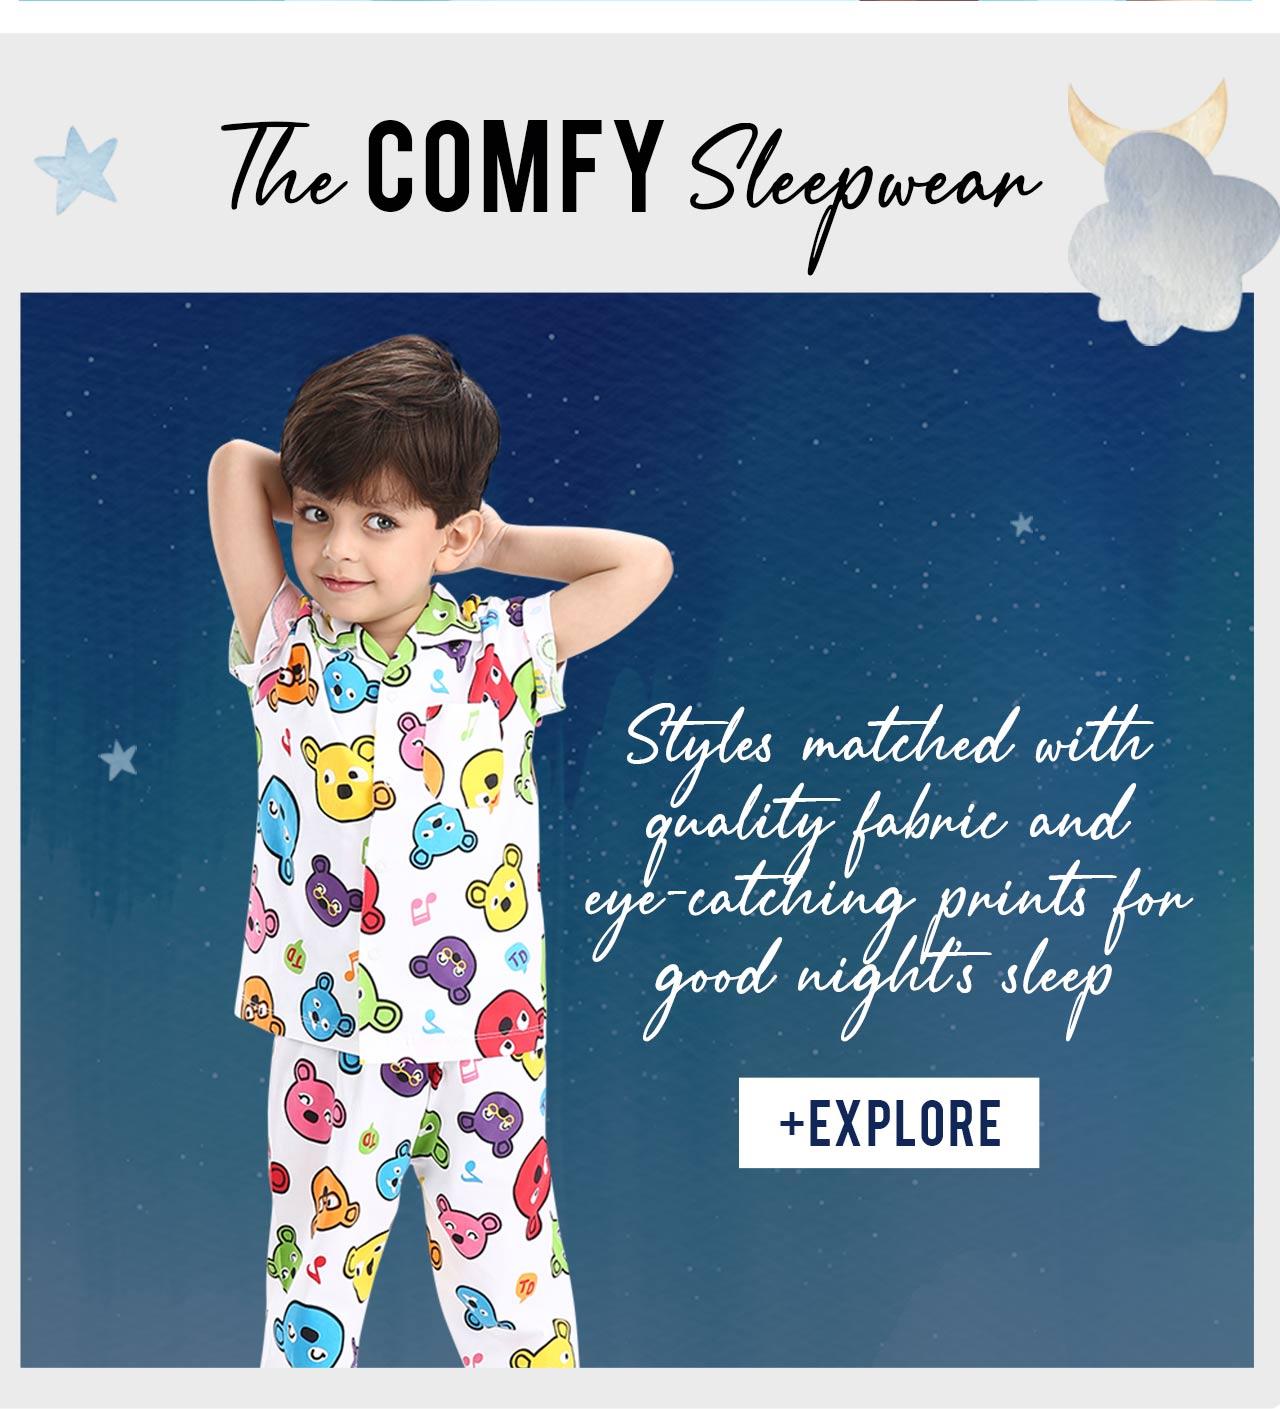 The Comfy Sleepwear